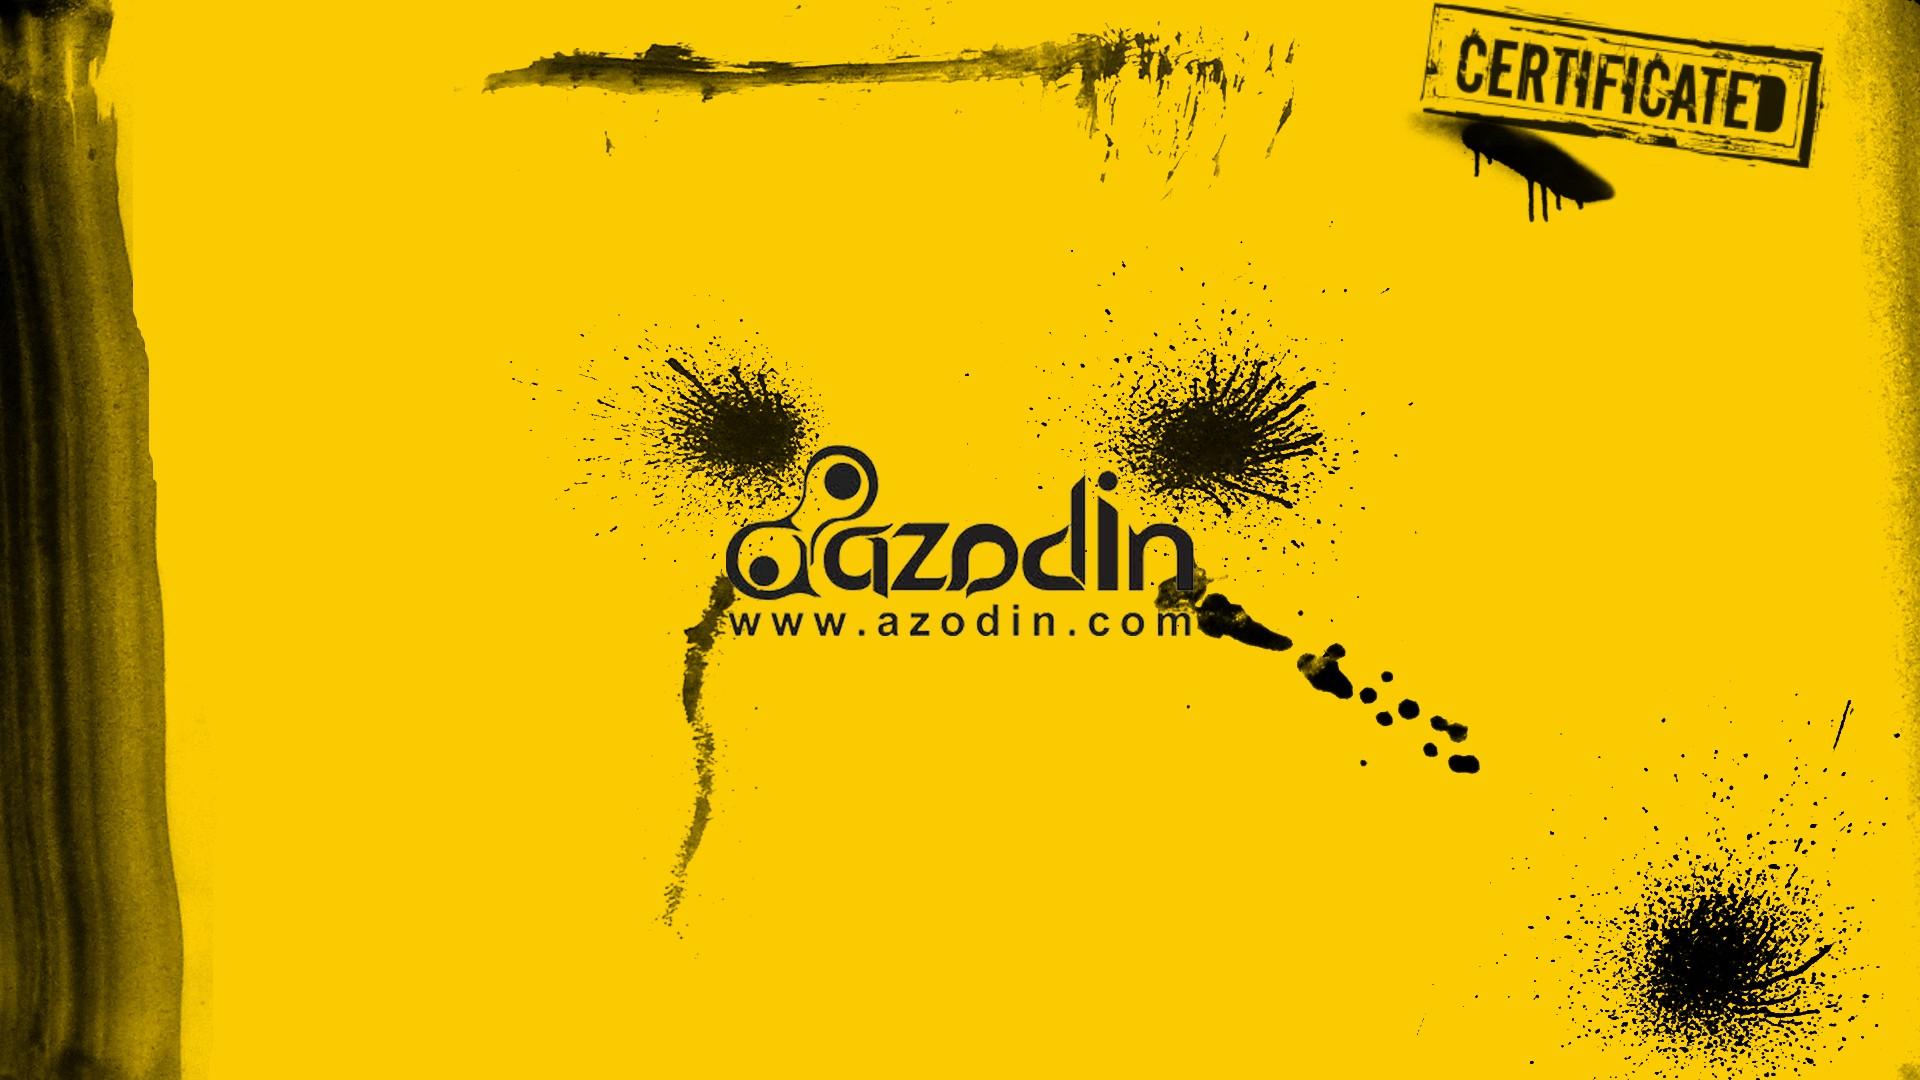 Azodin Website Address Yellow Background wallpaper art and 1920x1080